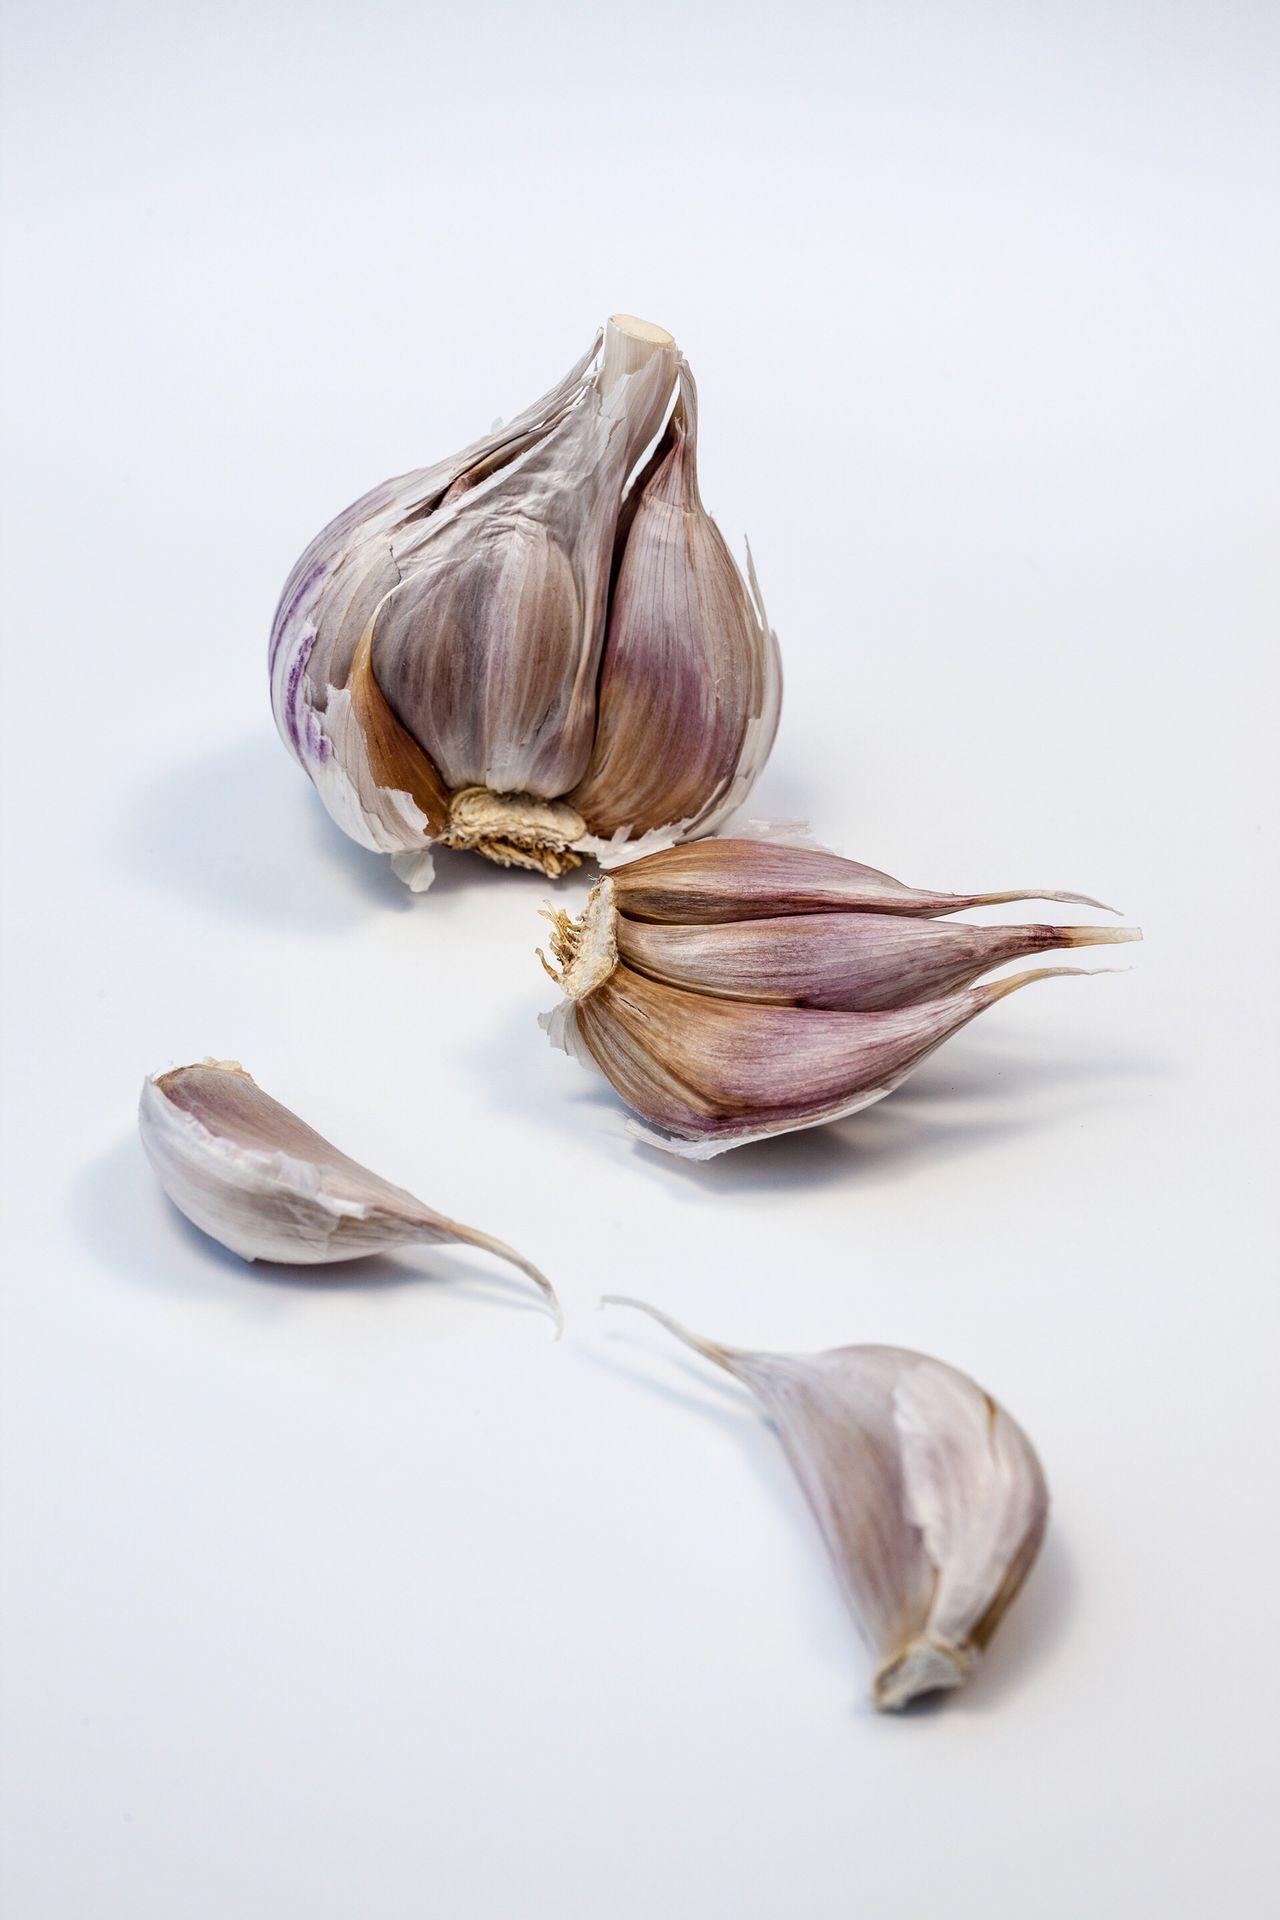 Garlic Studio Shot White Background Garlic Garlic Bulb Food Food And Drink No People Healthy Eating Freshness Close-up Garlic Clove Foodphotography Foodpics EyeEm Best Shots EyeEm Gallery